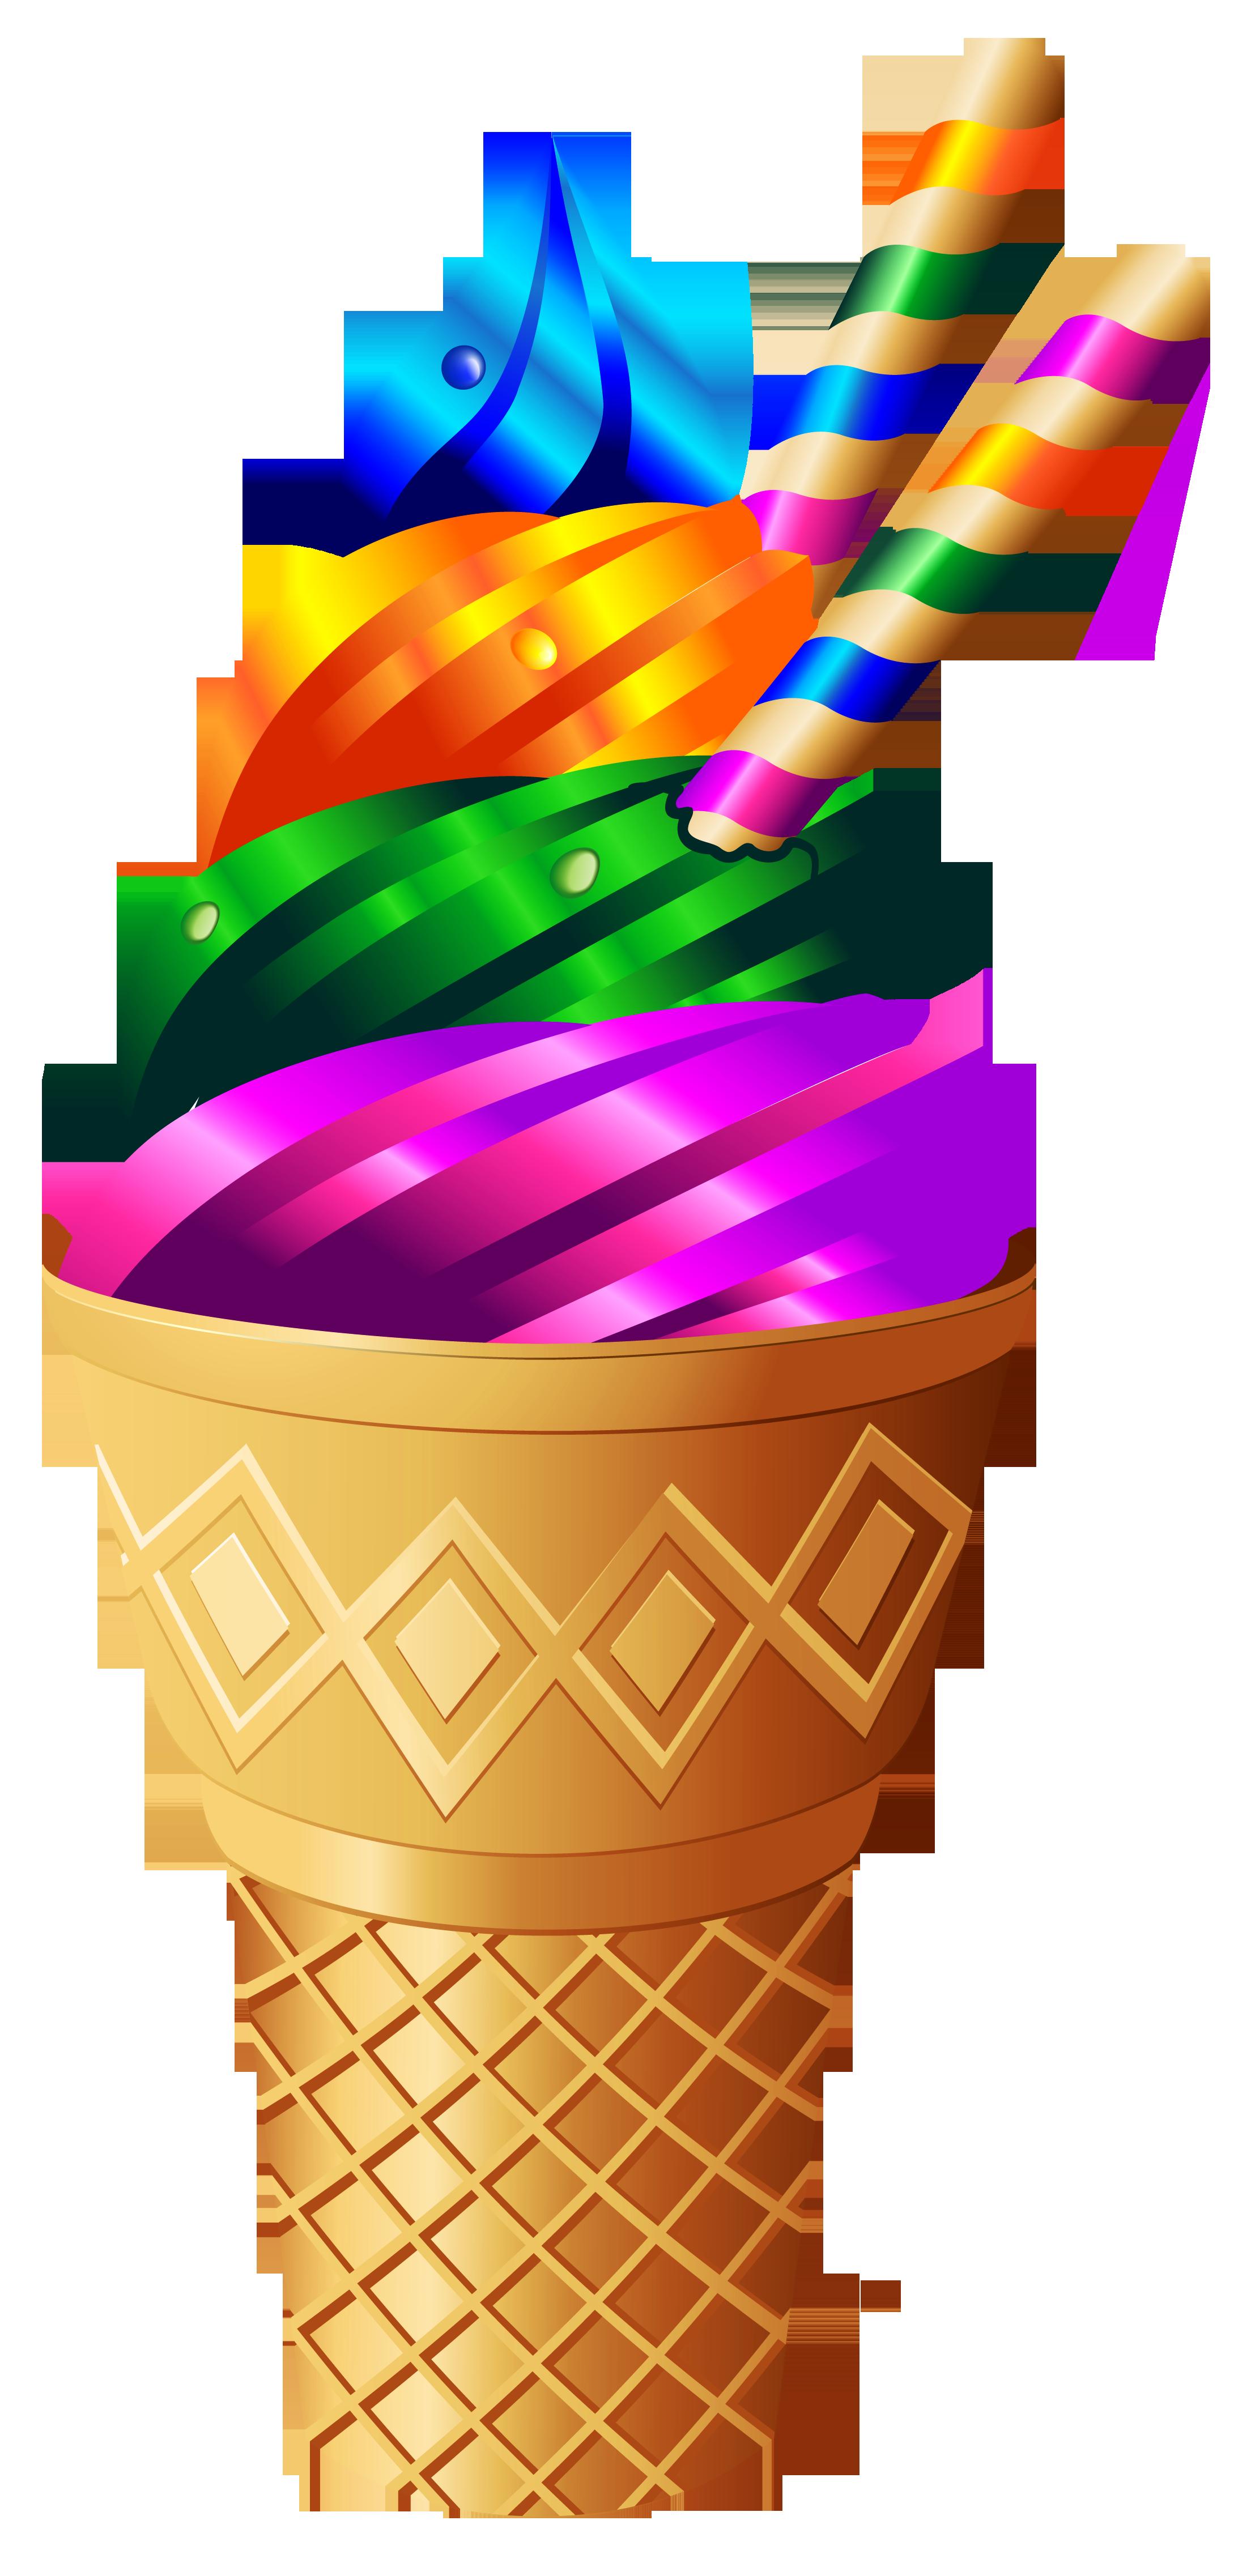 Rainbow ice cream png. Icecream clipart transparent background